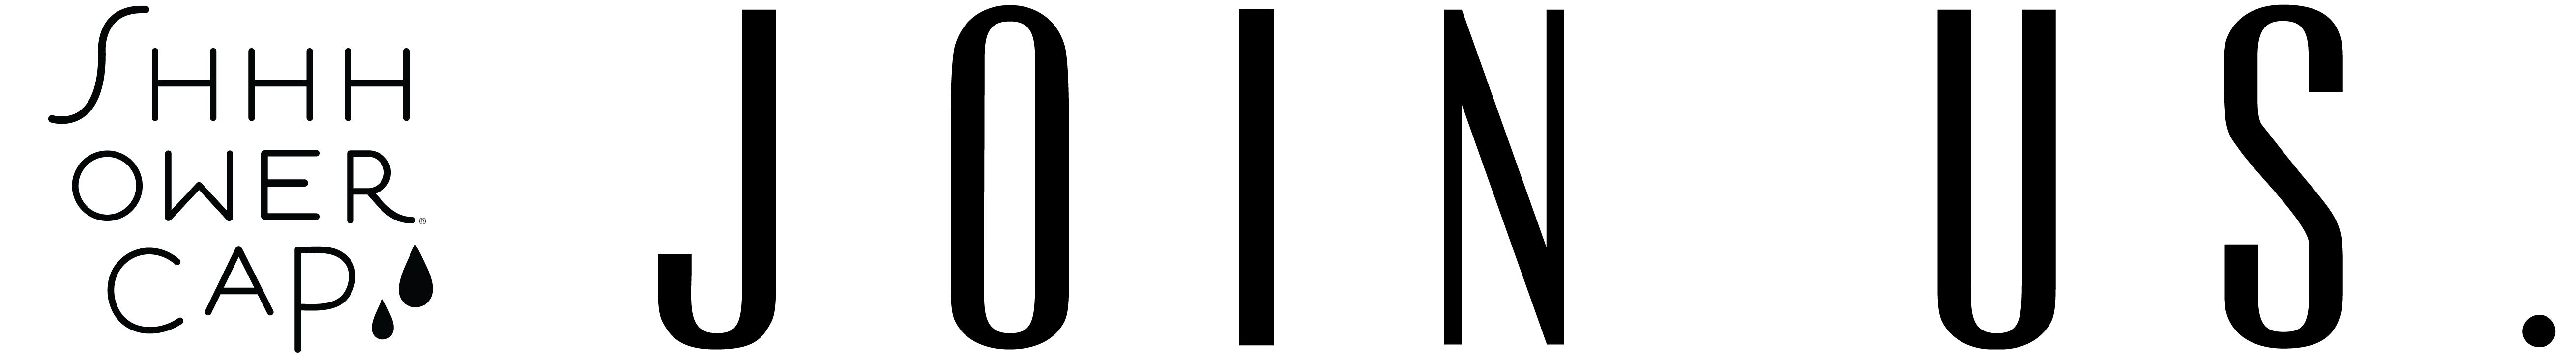 SHHHOWERCAP logo